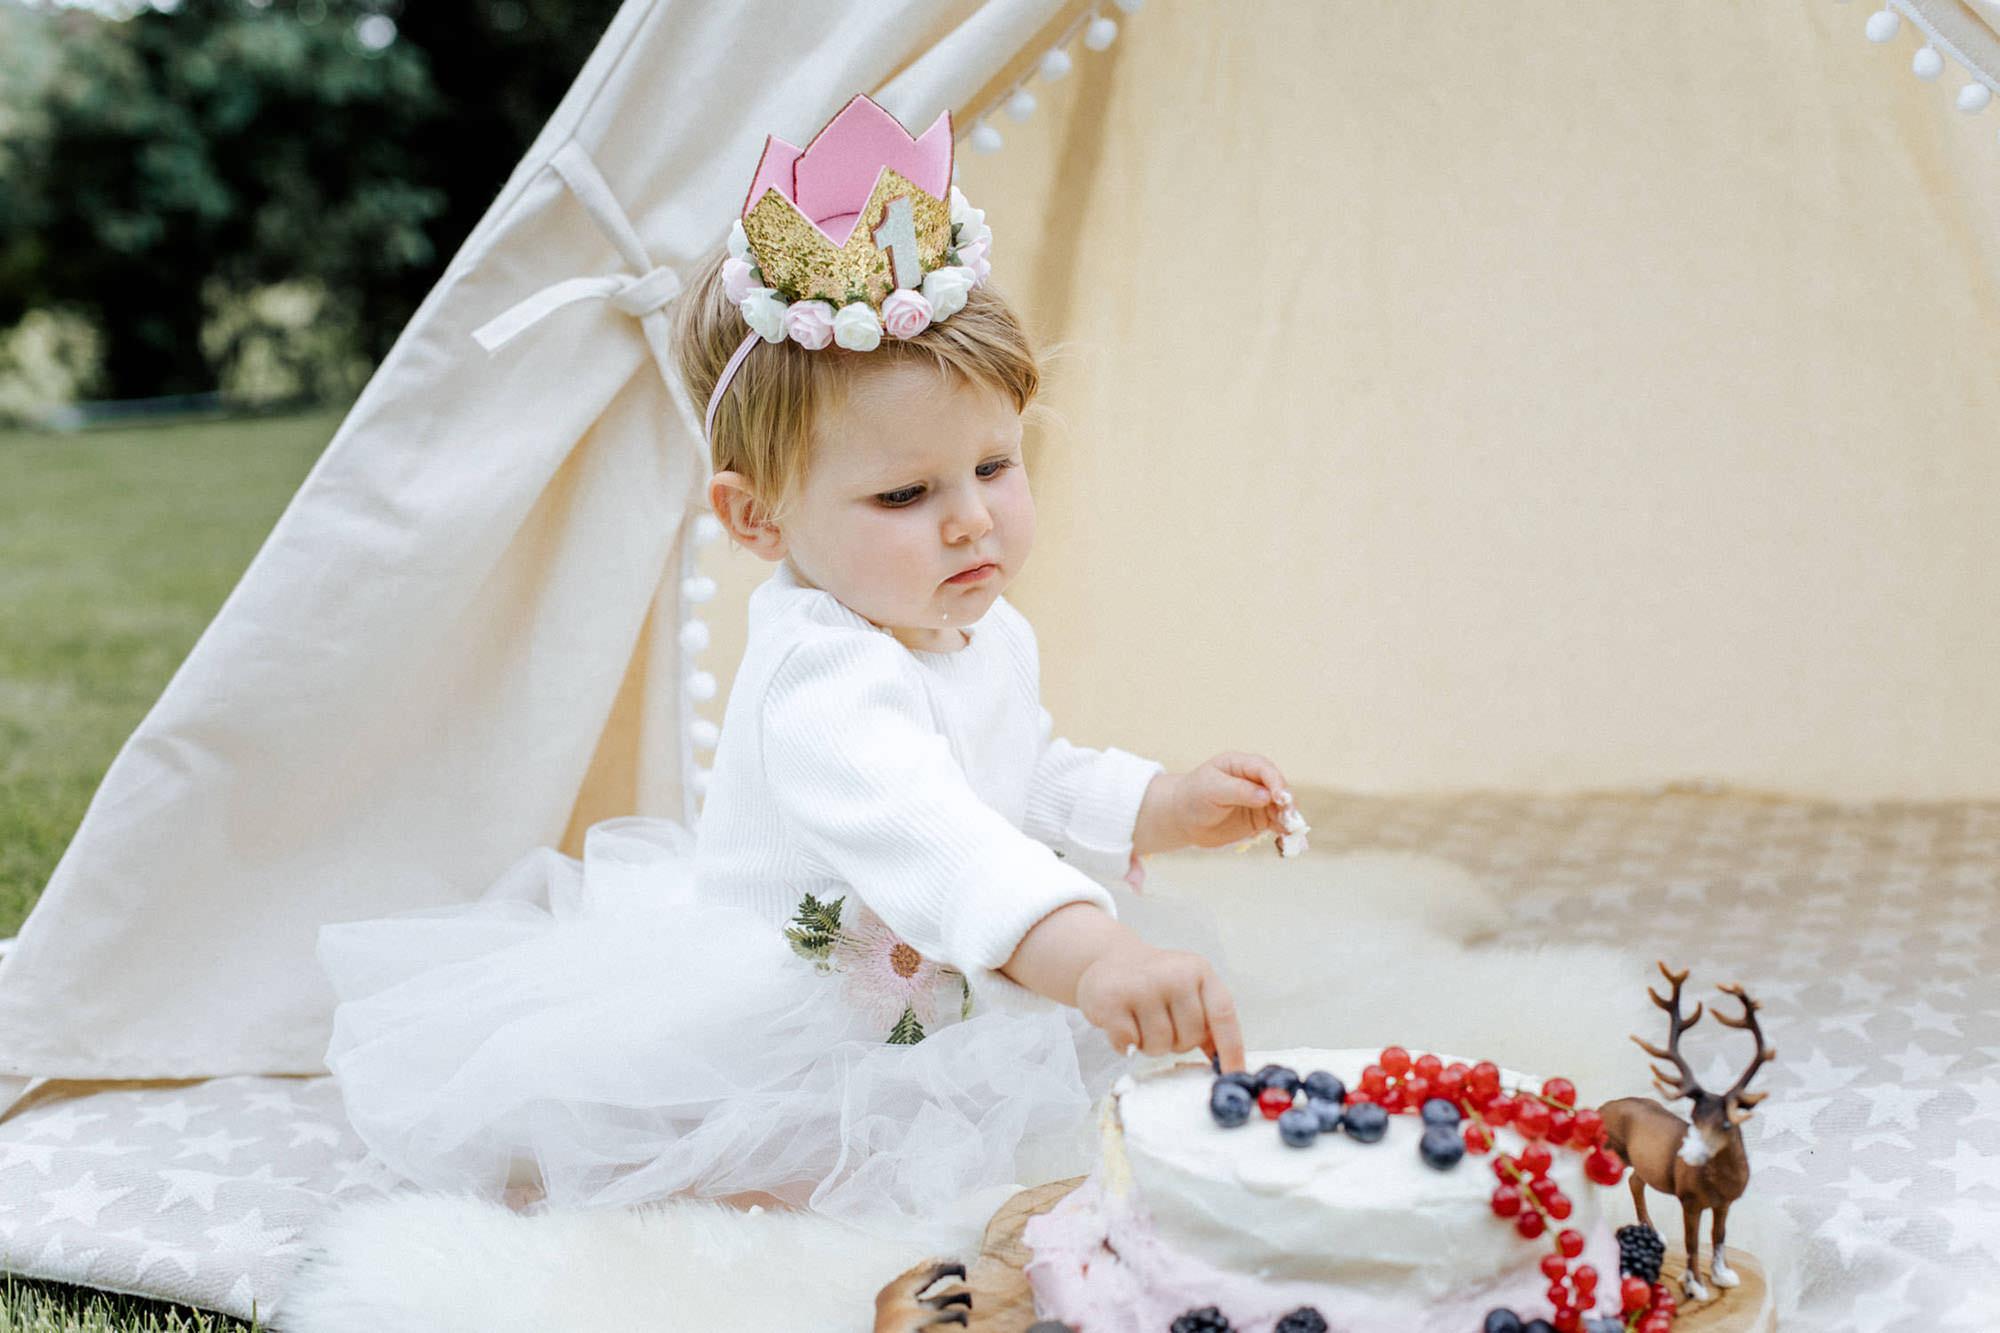 Cakesmash-Shooting-Josefins erster Geburtstag